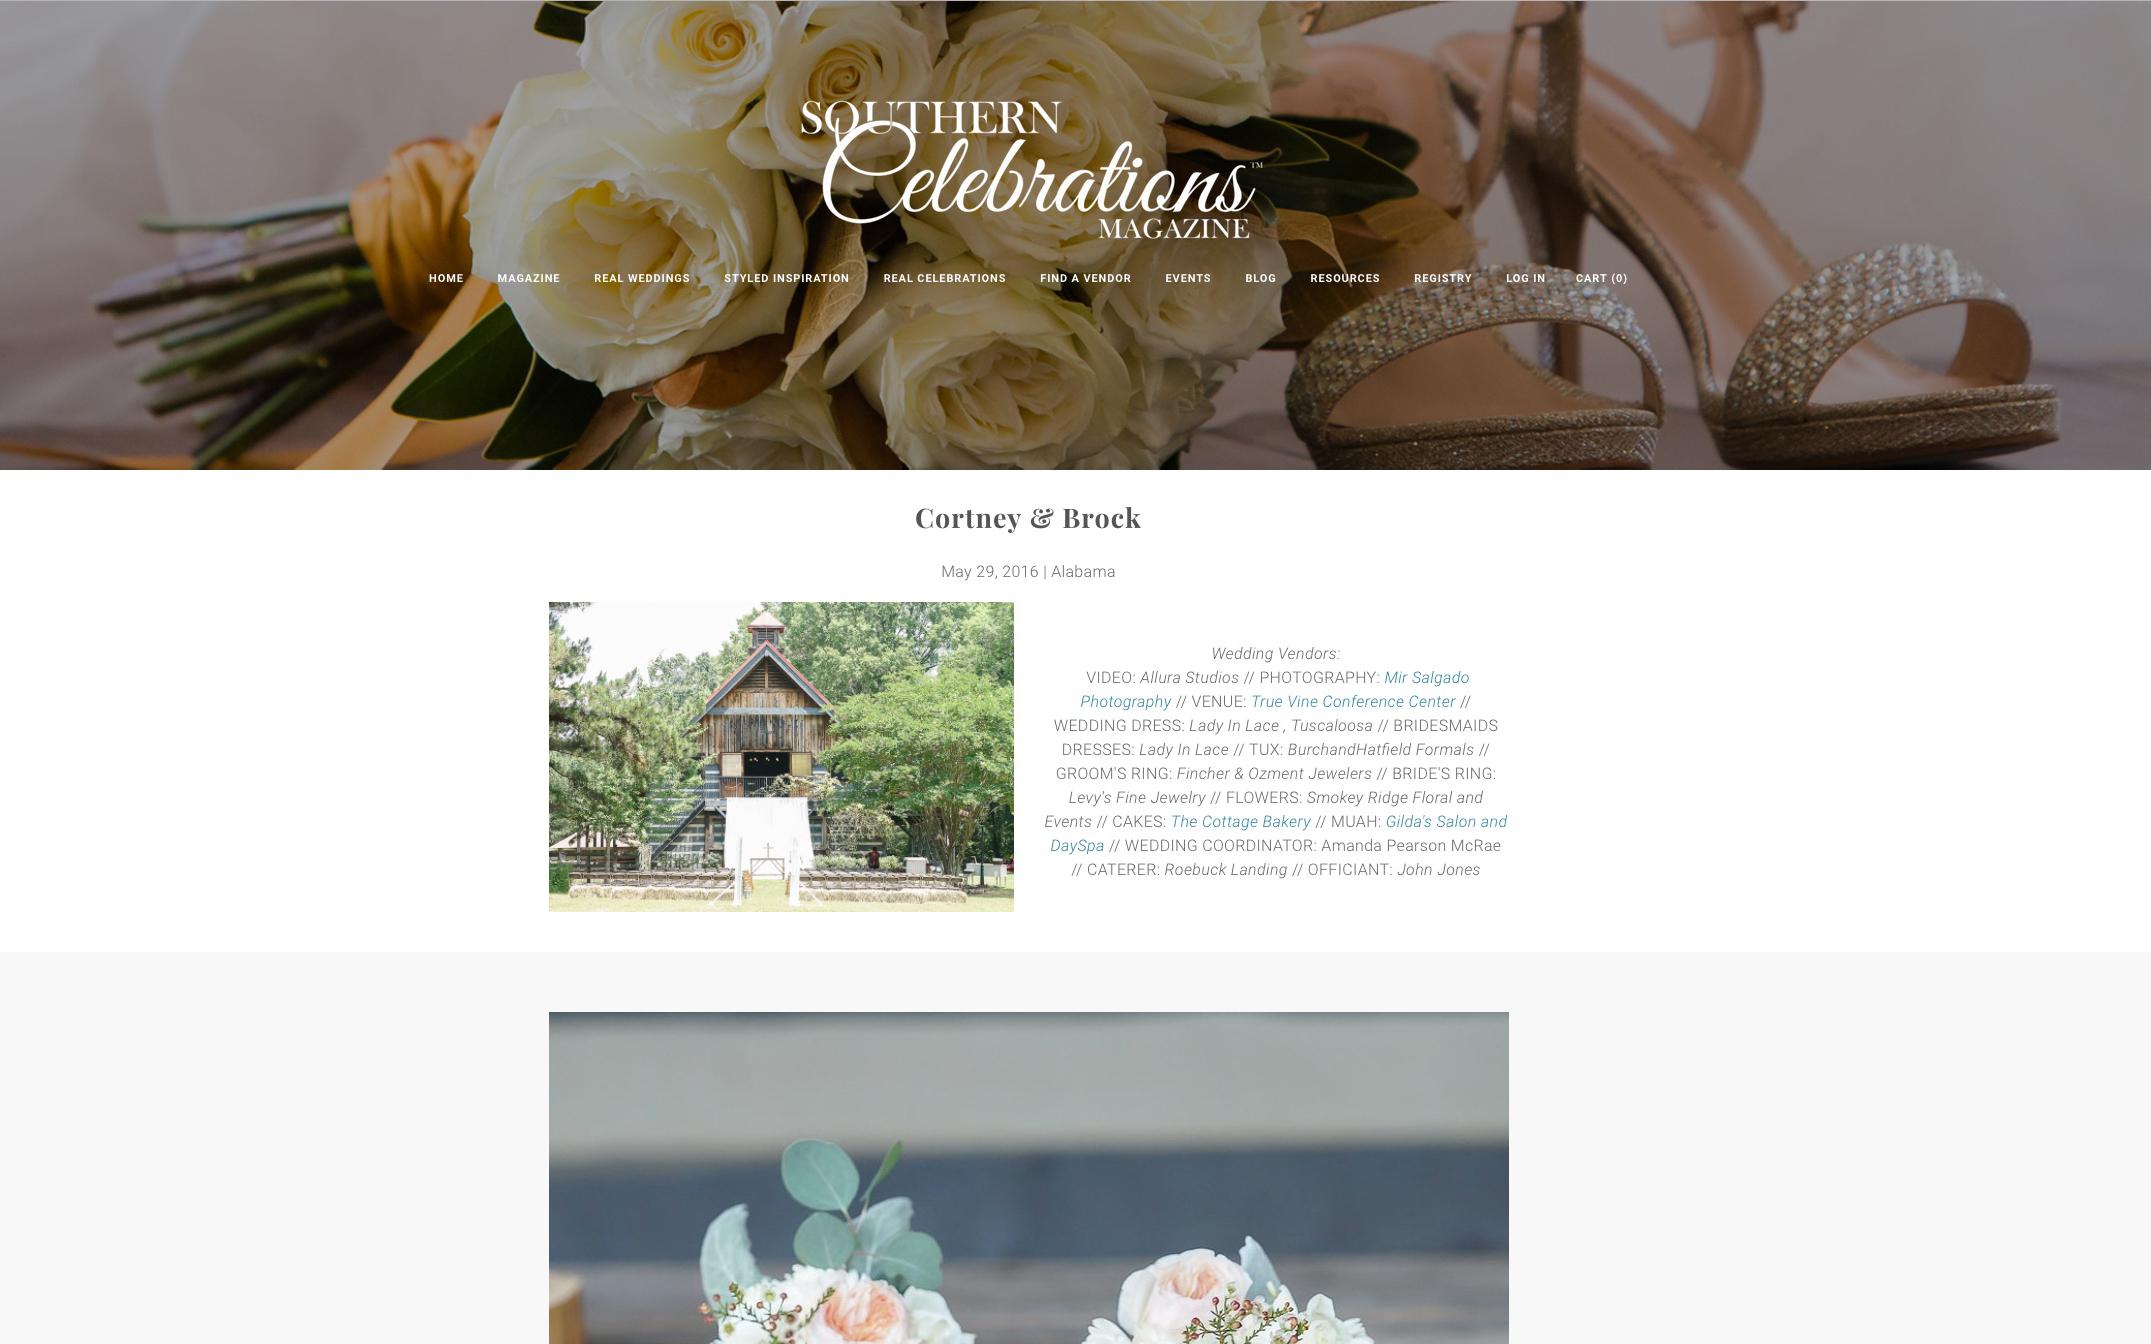 Southern-Celebrations-Magazine , tampa-wedding-photography